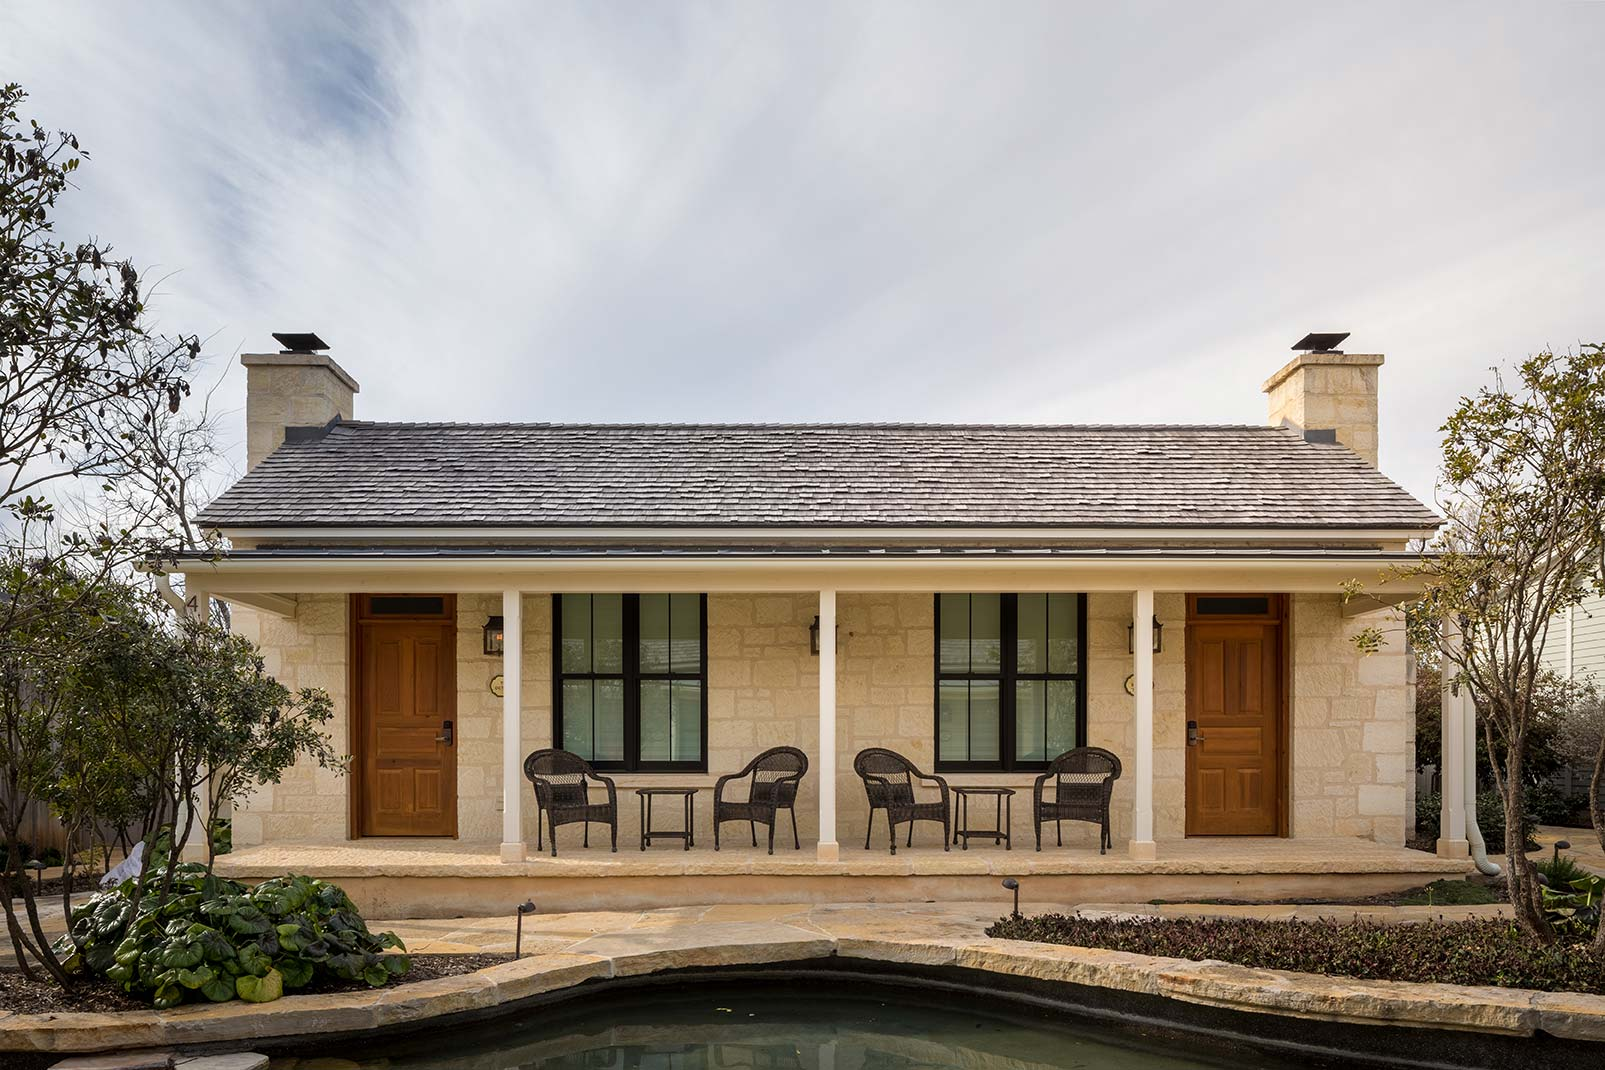 blacksmith-quarters-fredericksburg-realty-texas-hill-country-cabins-bnb-real-estate.jpg